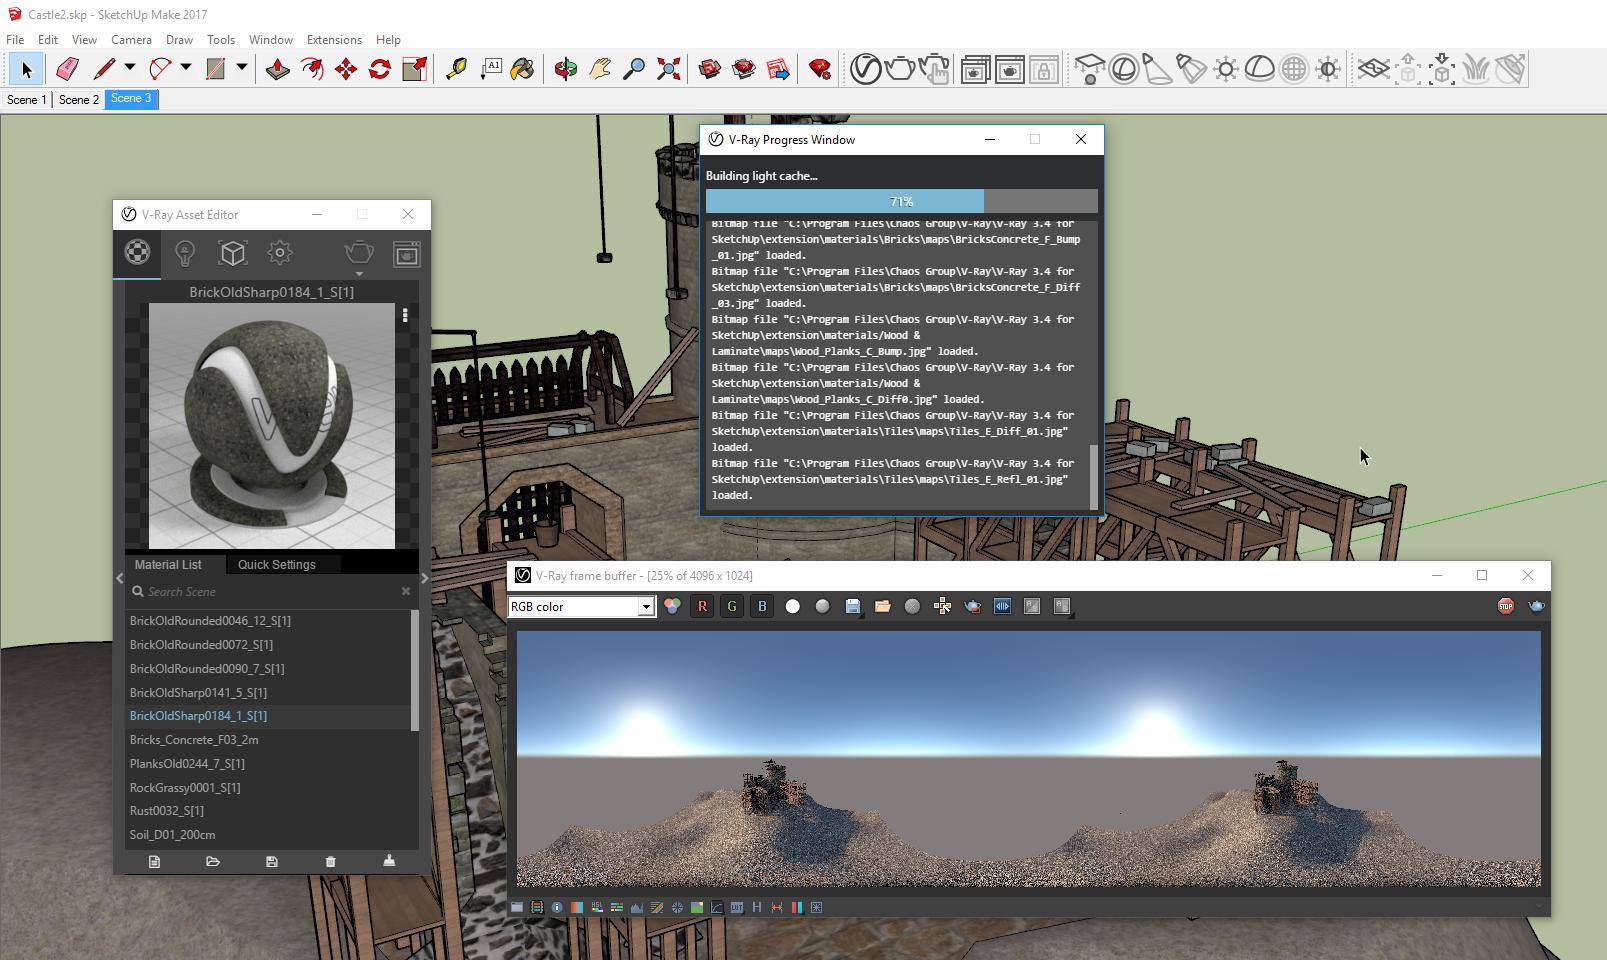 Batch Rendering with V-Ray in SketchUp - kasperhalkjaer com